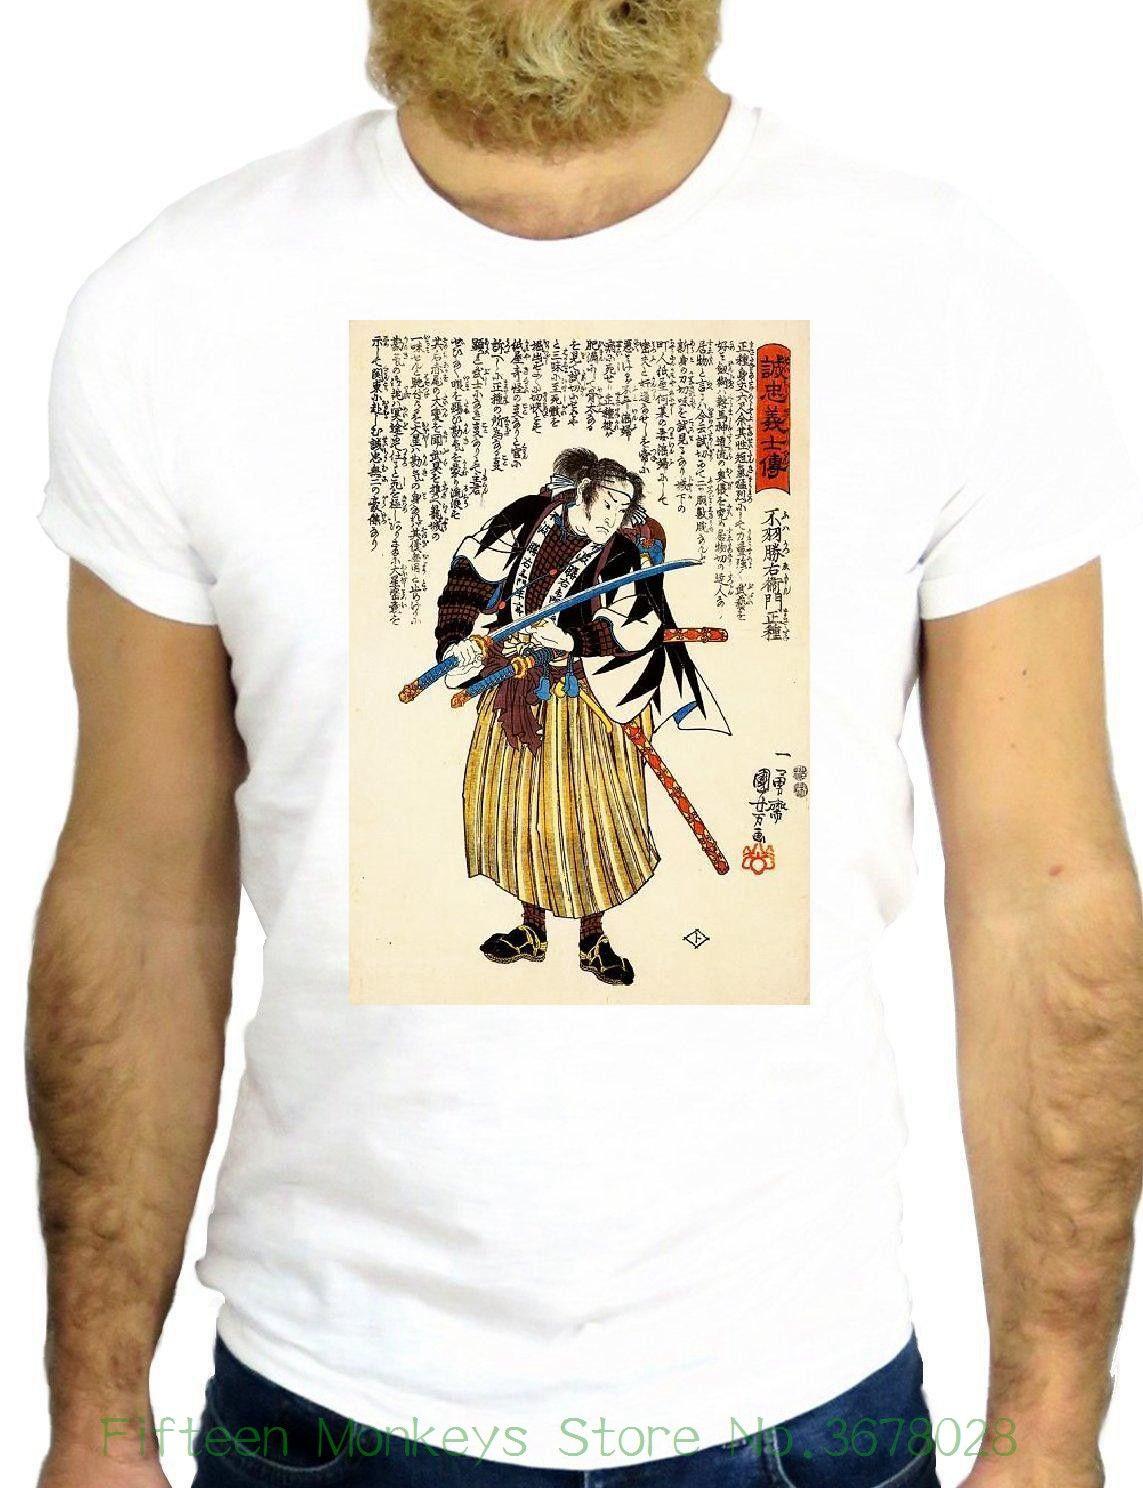 633a3f2e4290 Print T Shirt Men Summer T Shirt Jode Z1806 Japan Manga Cartoon Lady Funny  Cool Fashion Nice Ggg24 Funny Print T Shirts Shopping T Shirt Online From  ...